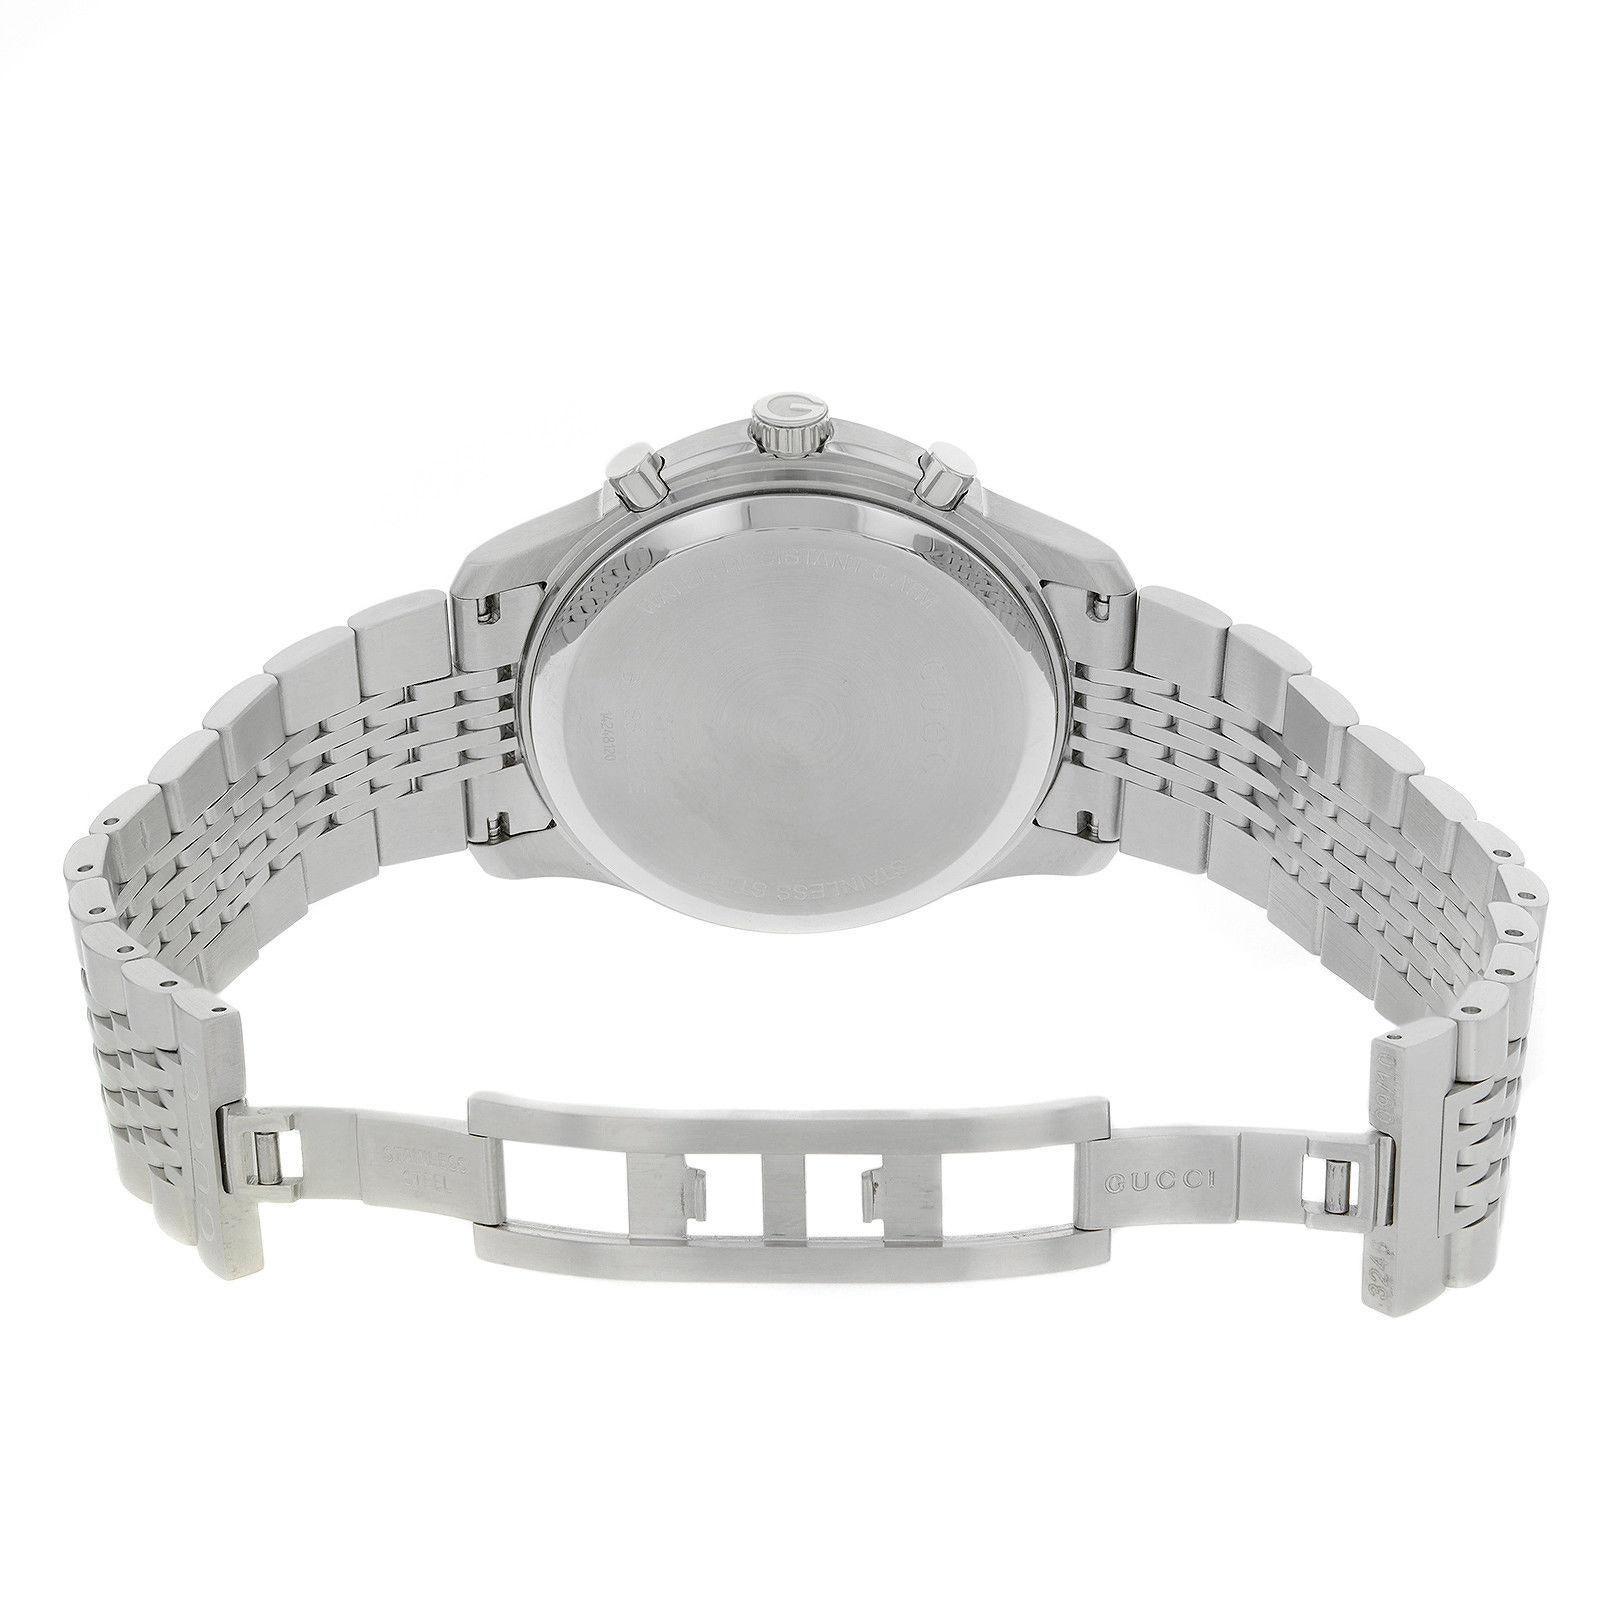 2d0081c59f4 Gucci 126 Chrono YA126221 Black Arabic Dial Stainless Steel Quartz Men s  Watch For Sale at 1stdibs